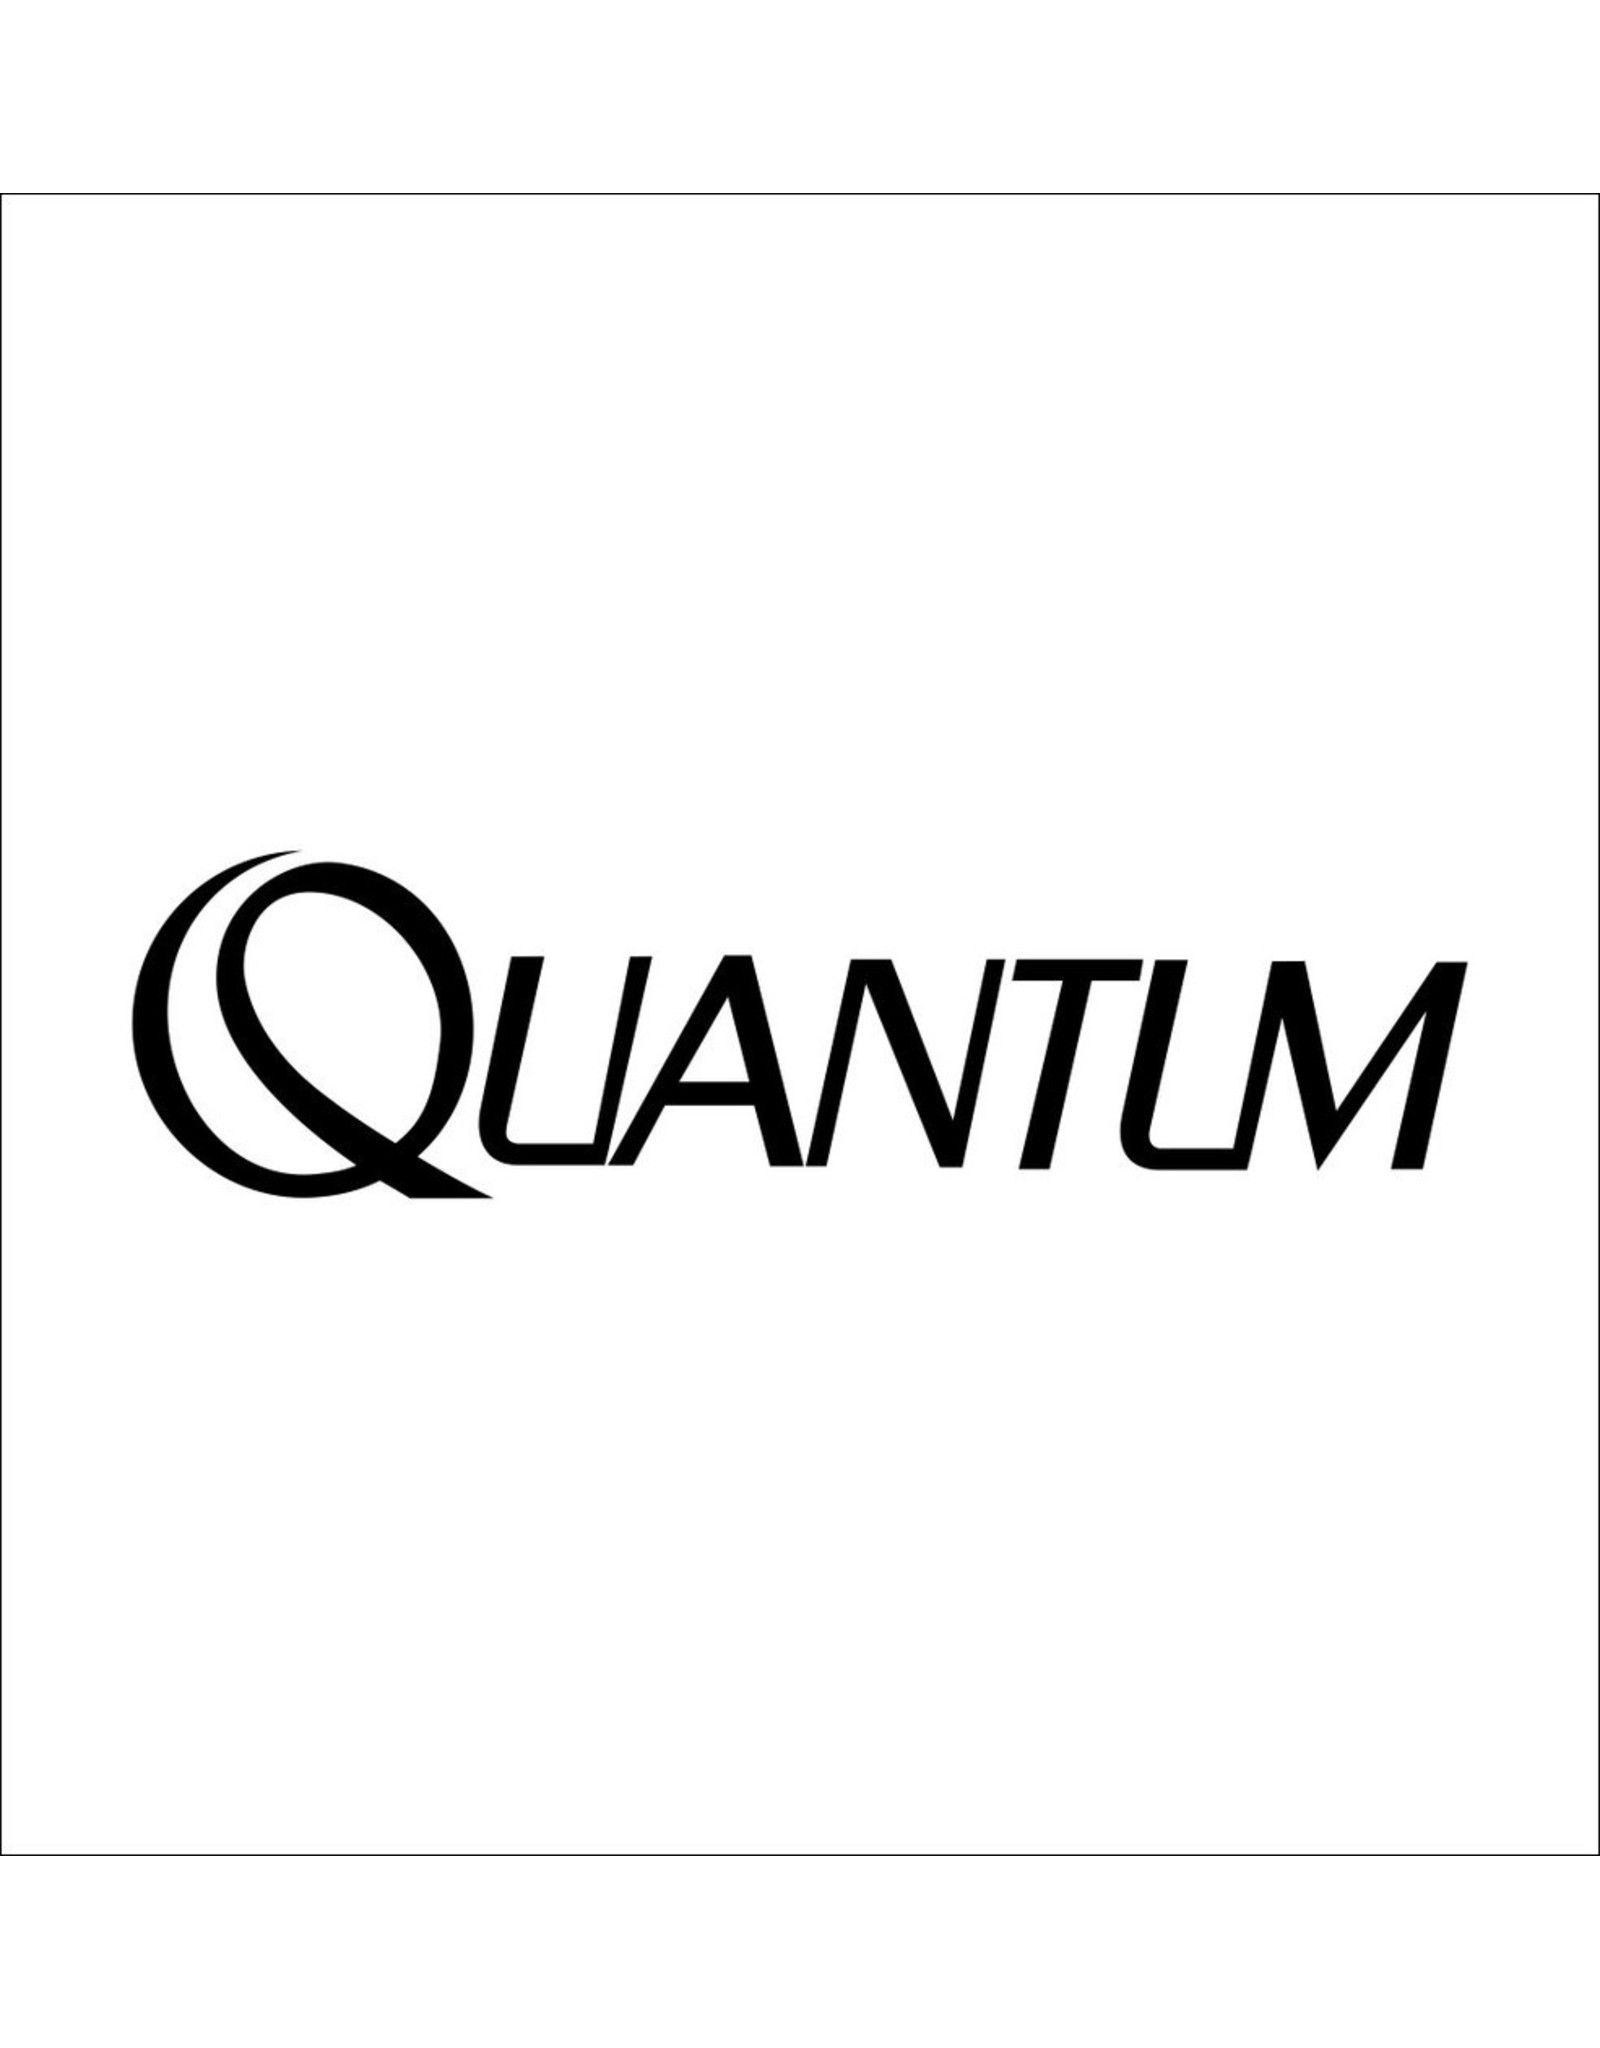 Quantum BODY REAR COVER - TOP